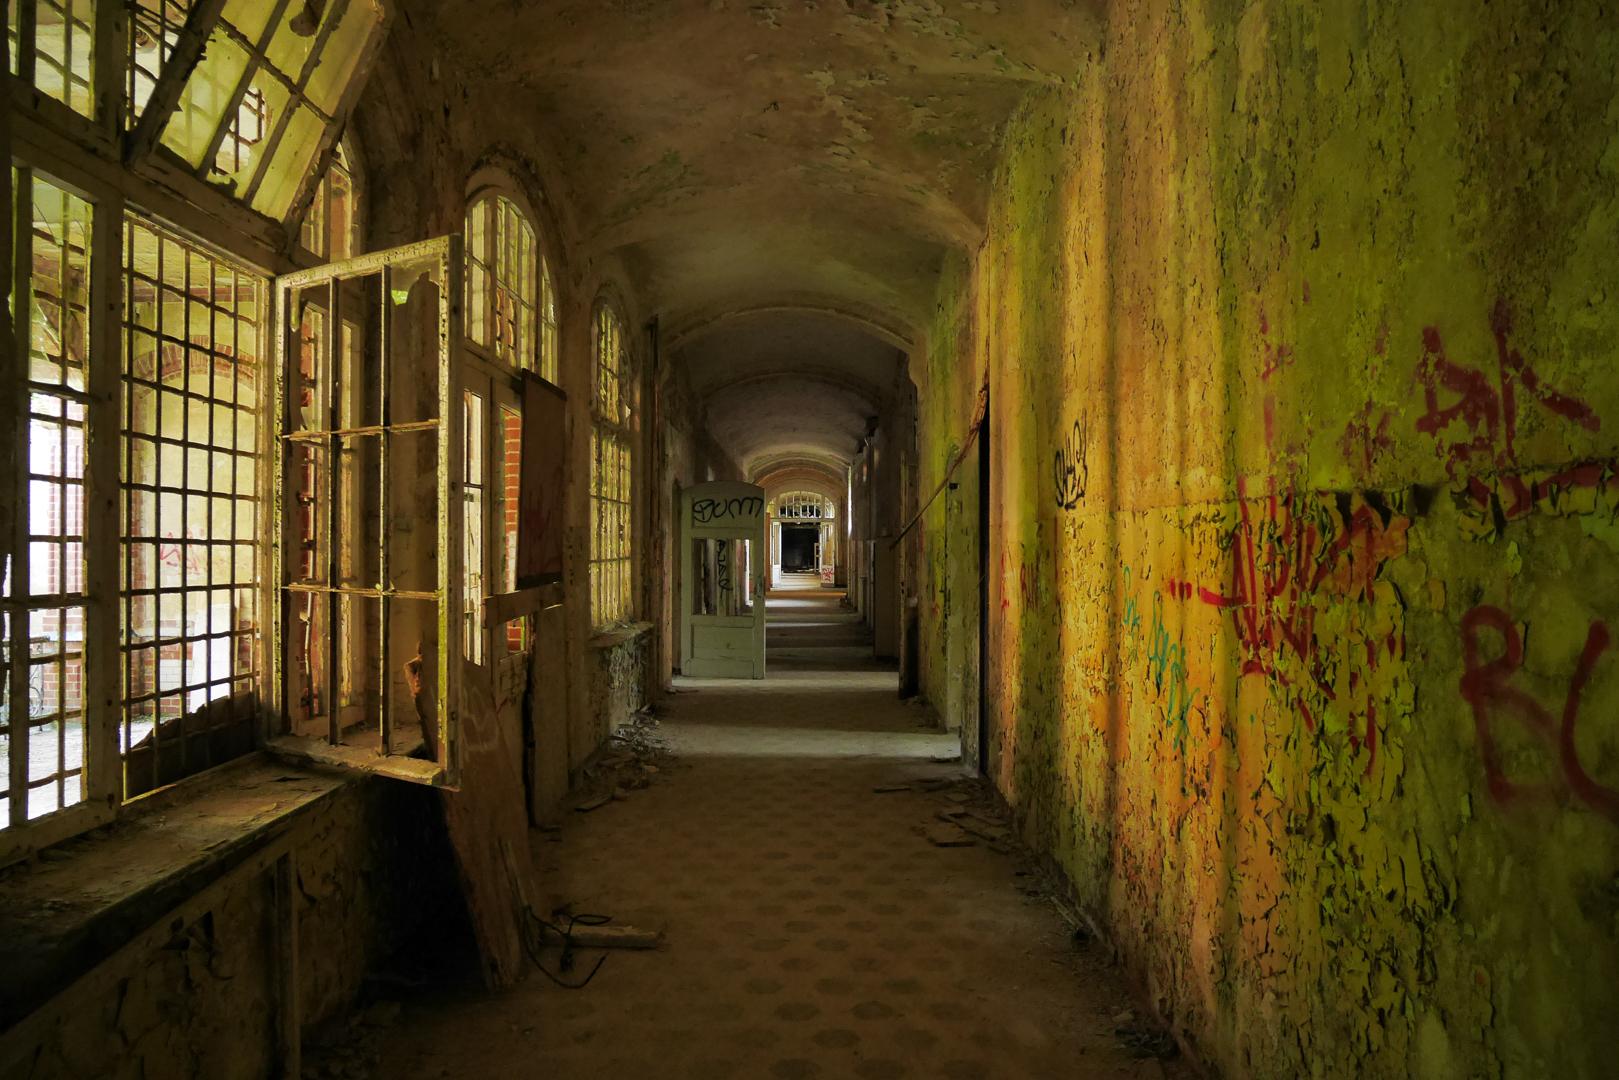 GERMANY, Beelitz-Heilstätten – Abandoned former sanatorium turn